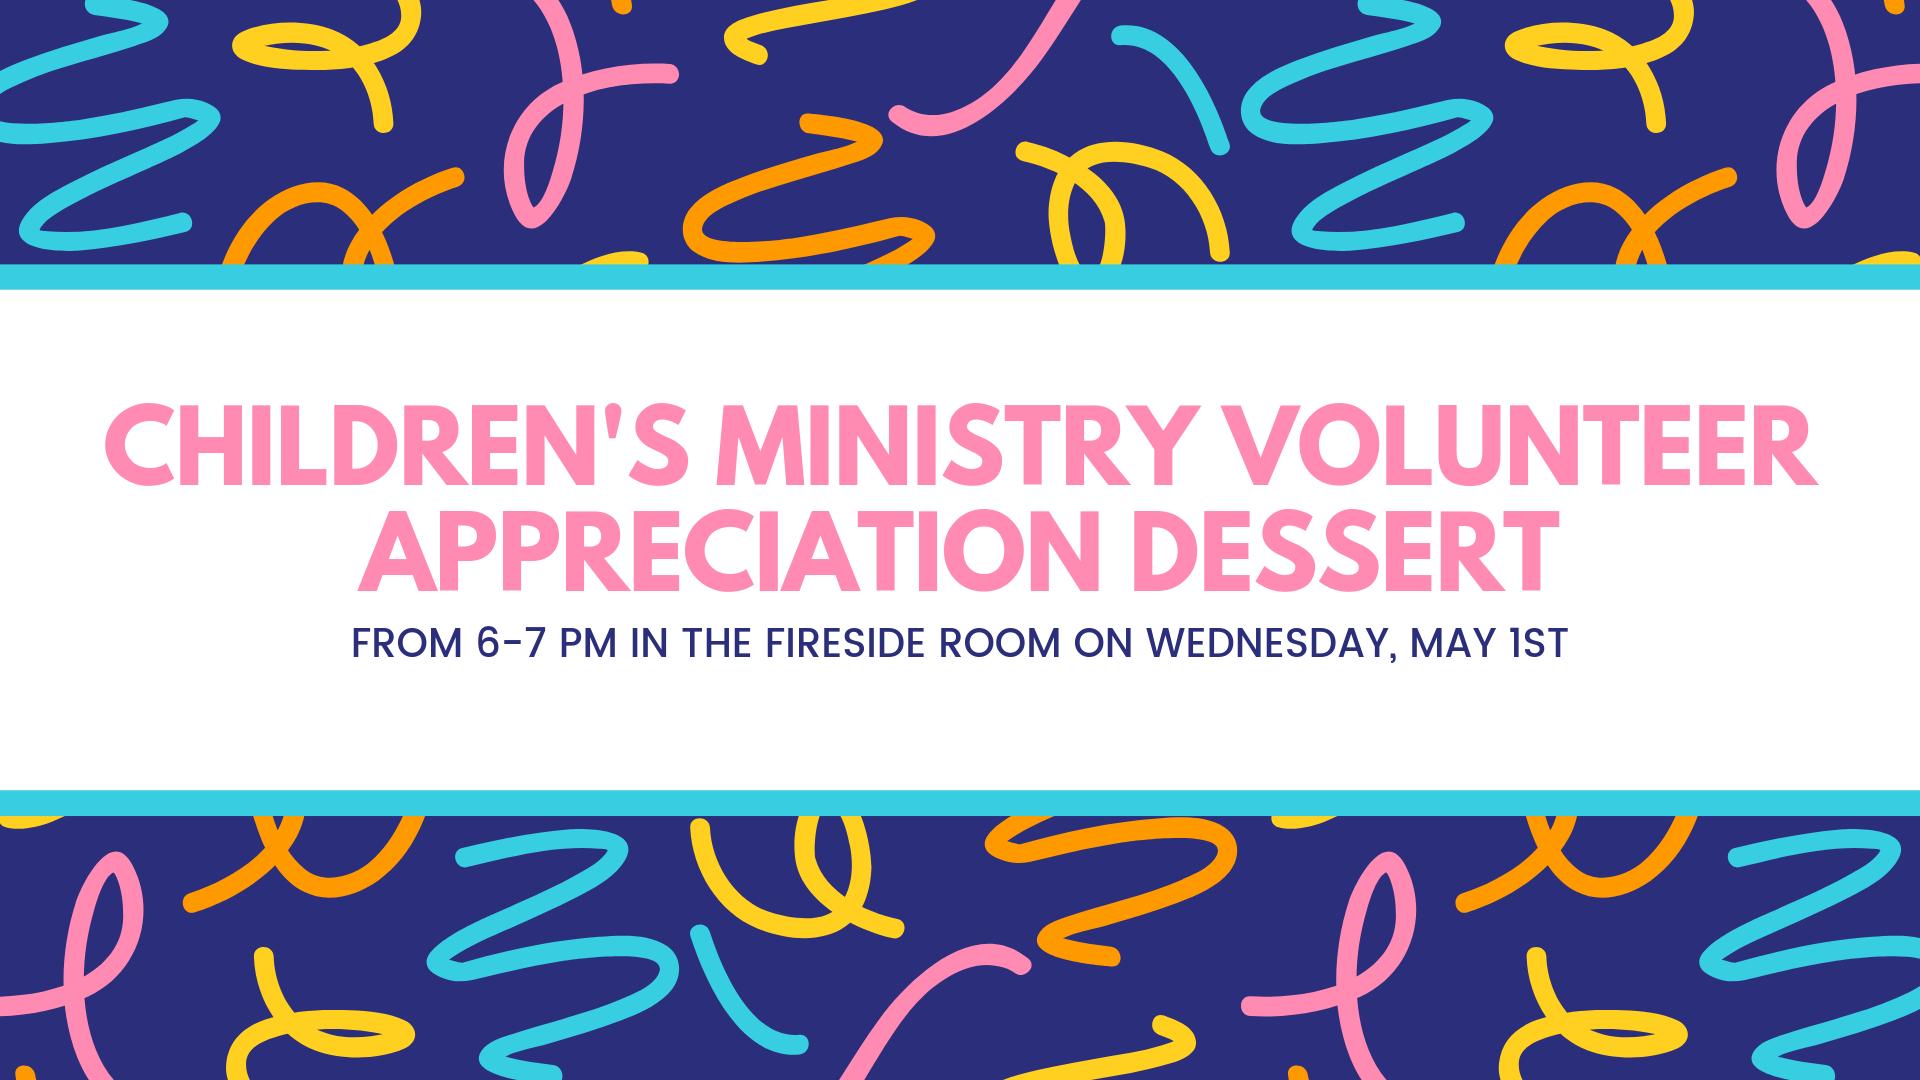 Childrens Ministry Volunteer Appreciation Dessert.png